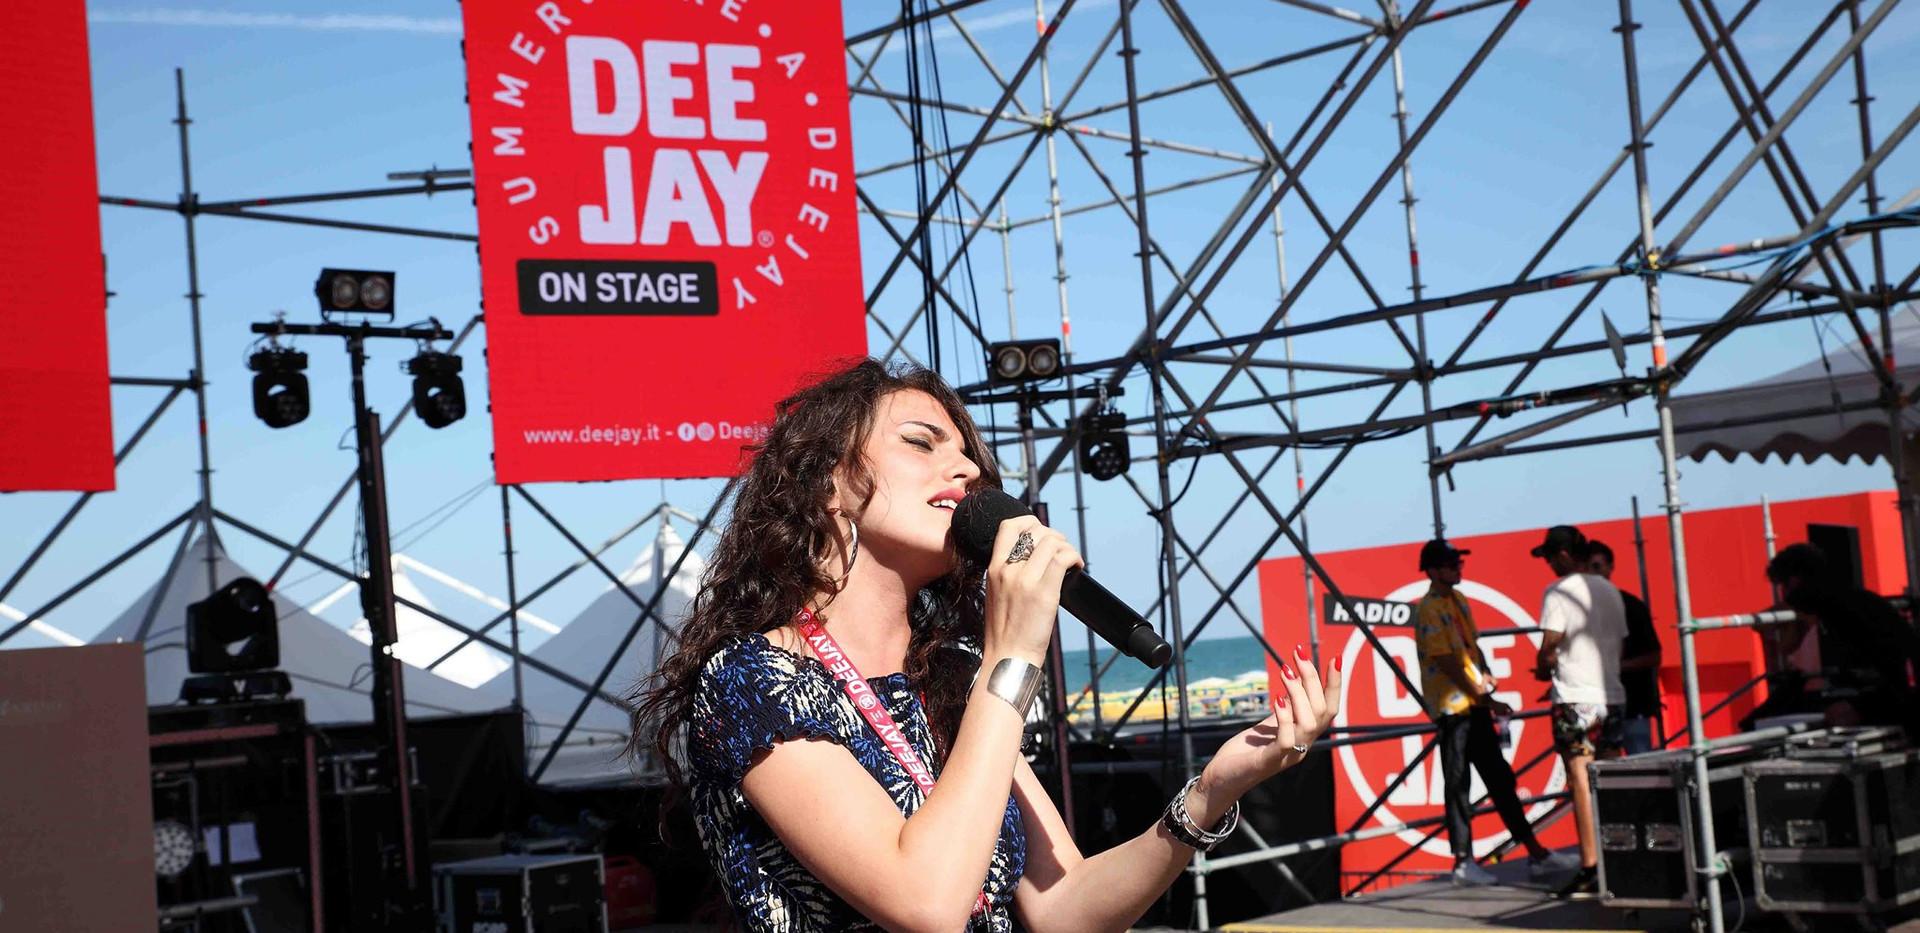 Silvia deejay on stage 3.jpg